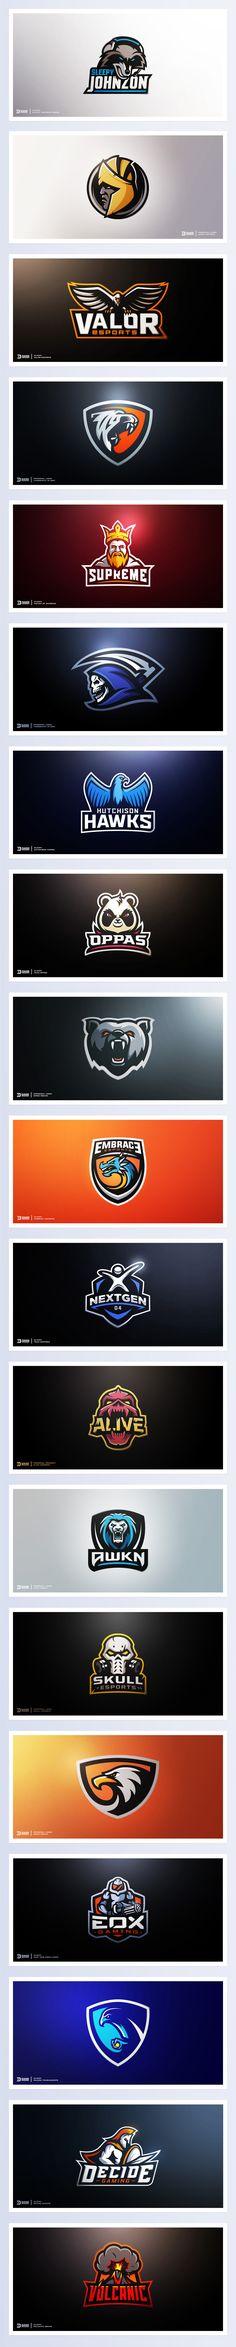 Logo Folio 2016 | Sports, Gaming, & Esports on Behance